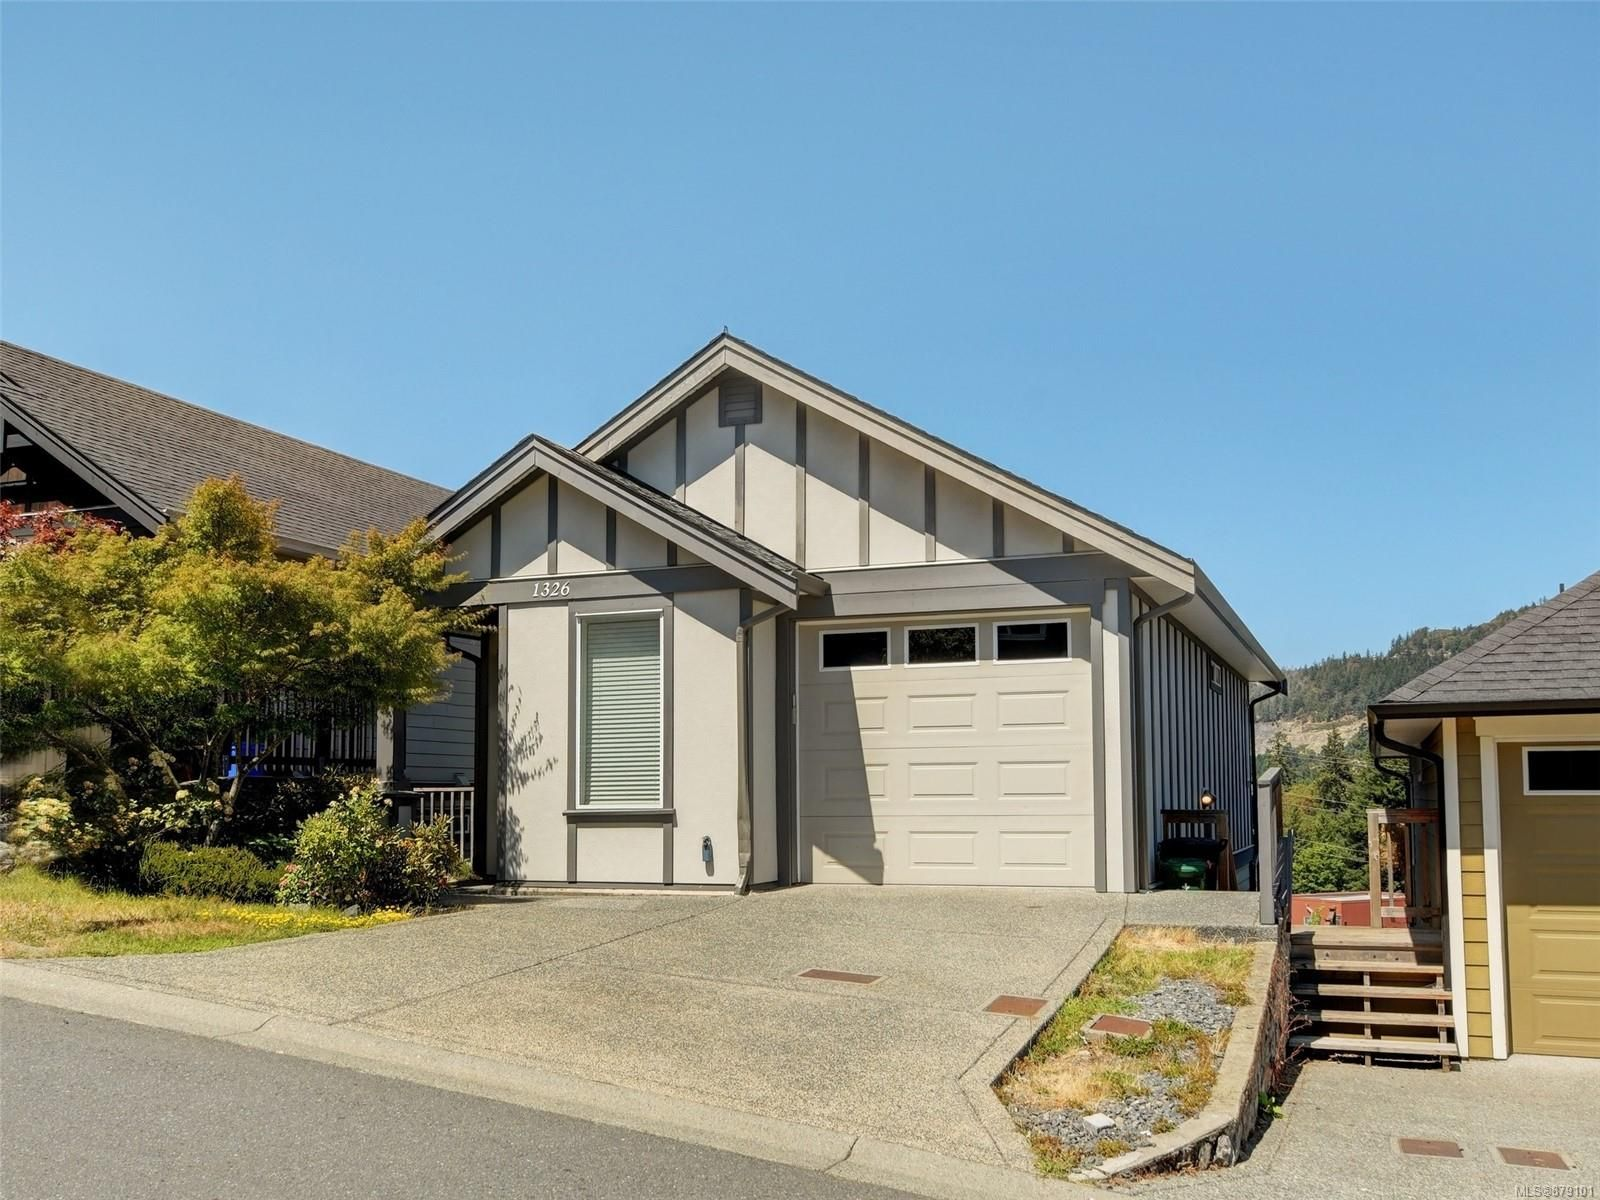 Main Photo: 1326 Artesian Crt in : La Westhills House for sale (Langford)  : MLS®# 879101